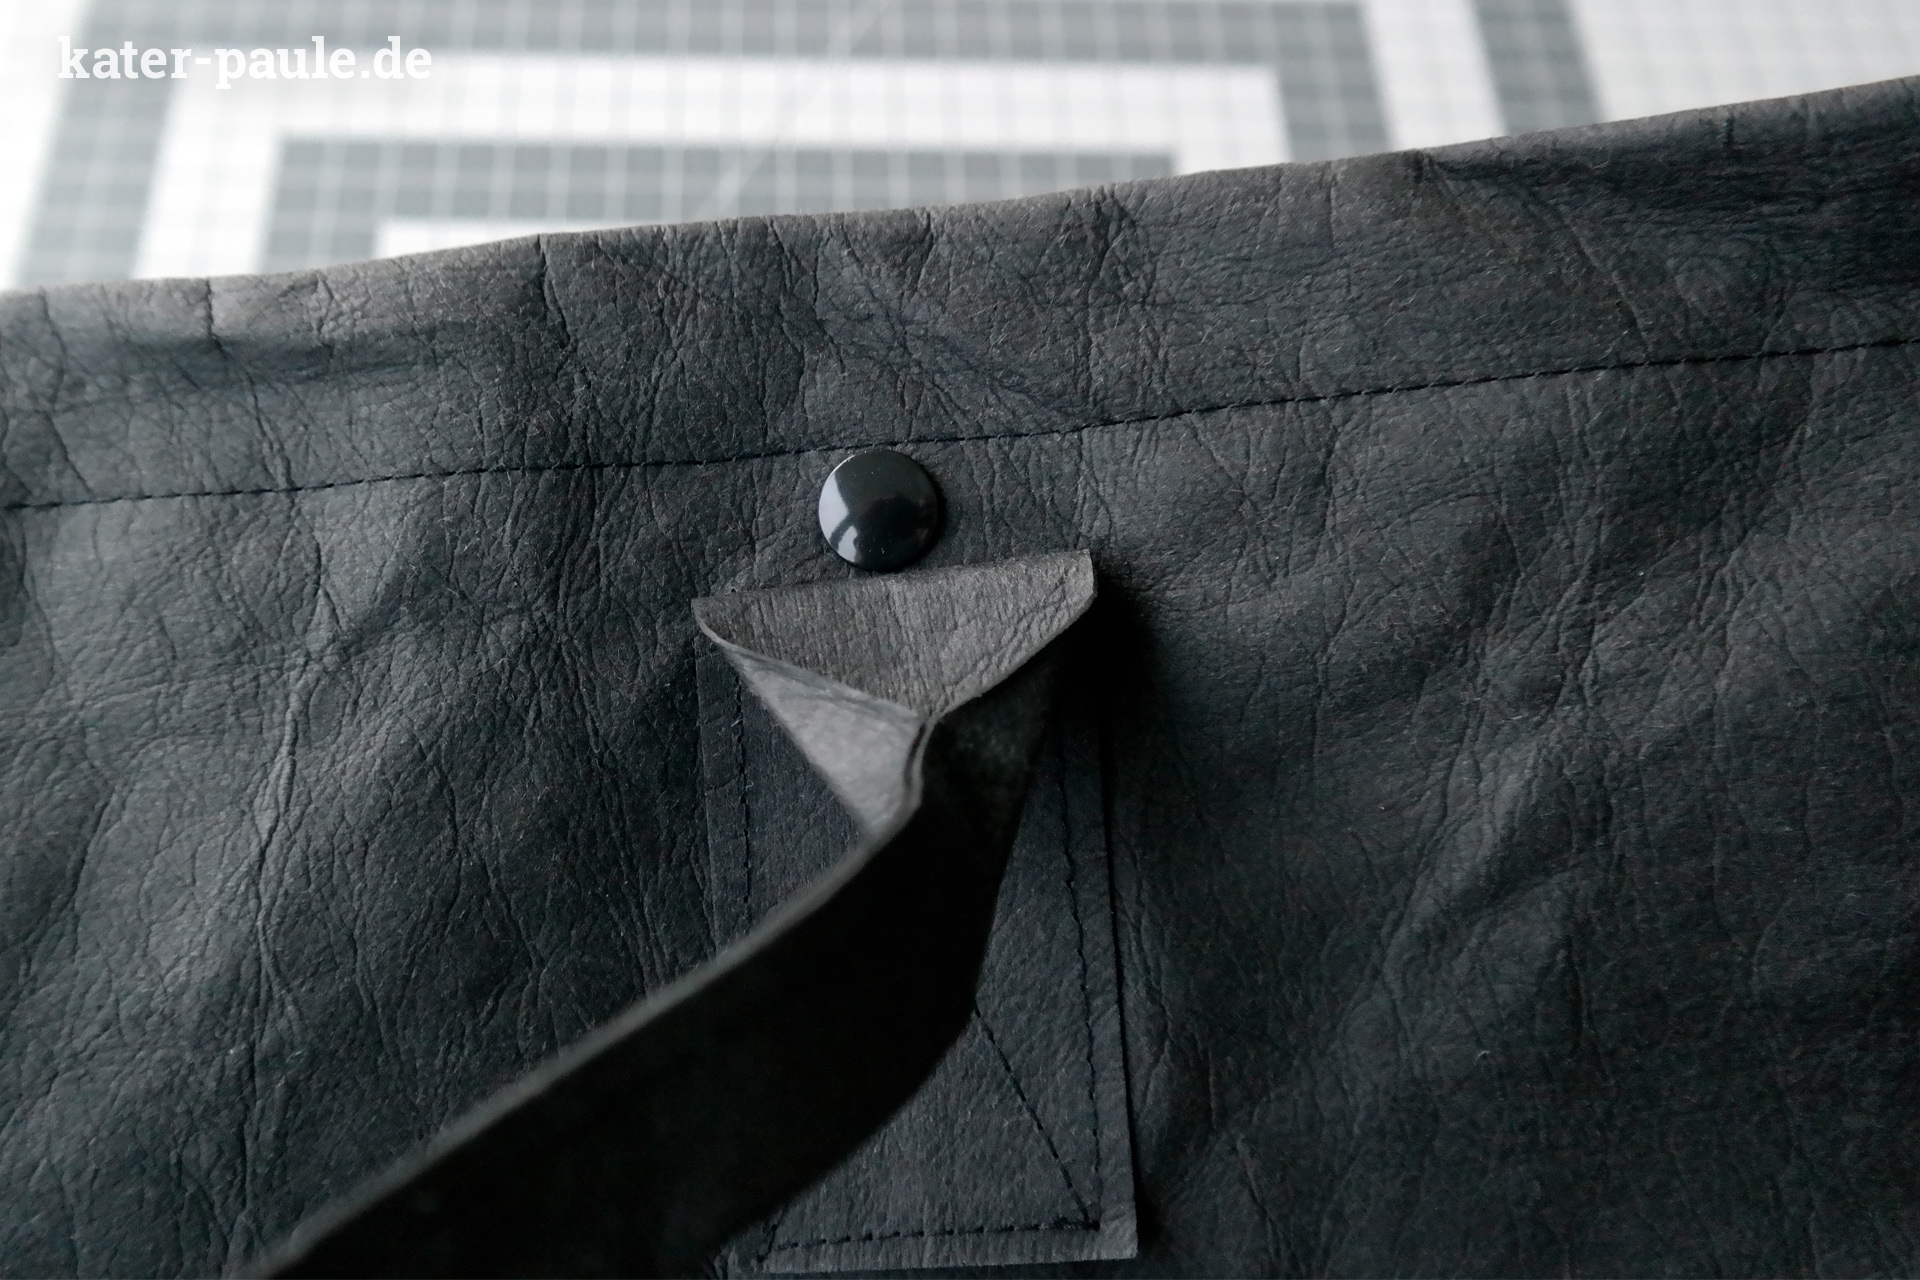 Den Saum ca. 2,5 nach innen RatzFatz Rucksack / Tutorial / Schnittmuster /Backpack / Tasche / Handmade / Herbst / DIY / Black / SnapPap Plus / SnapPap / Kater Paule / Nähgedönsund absteppen.